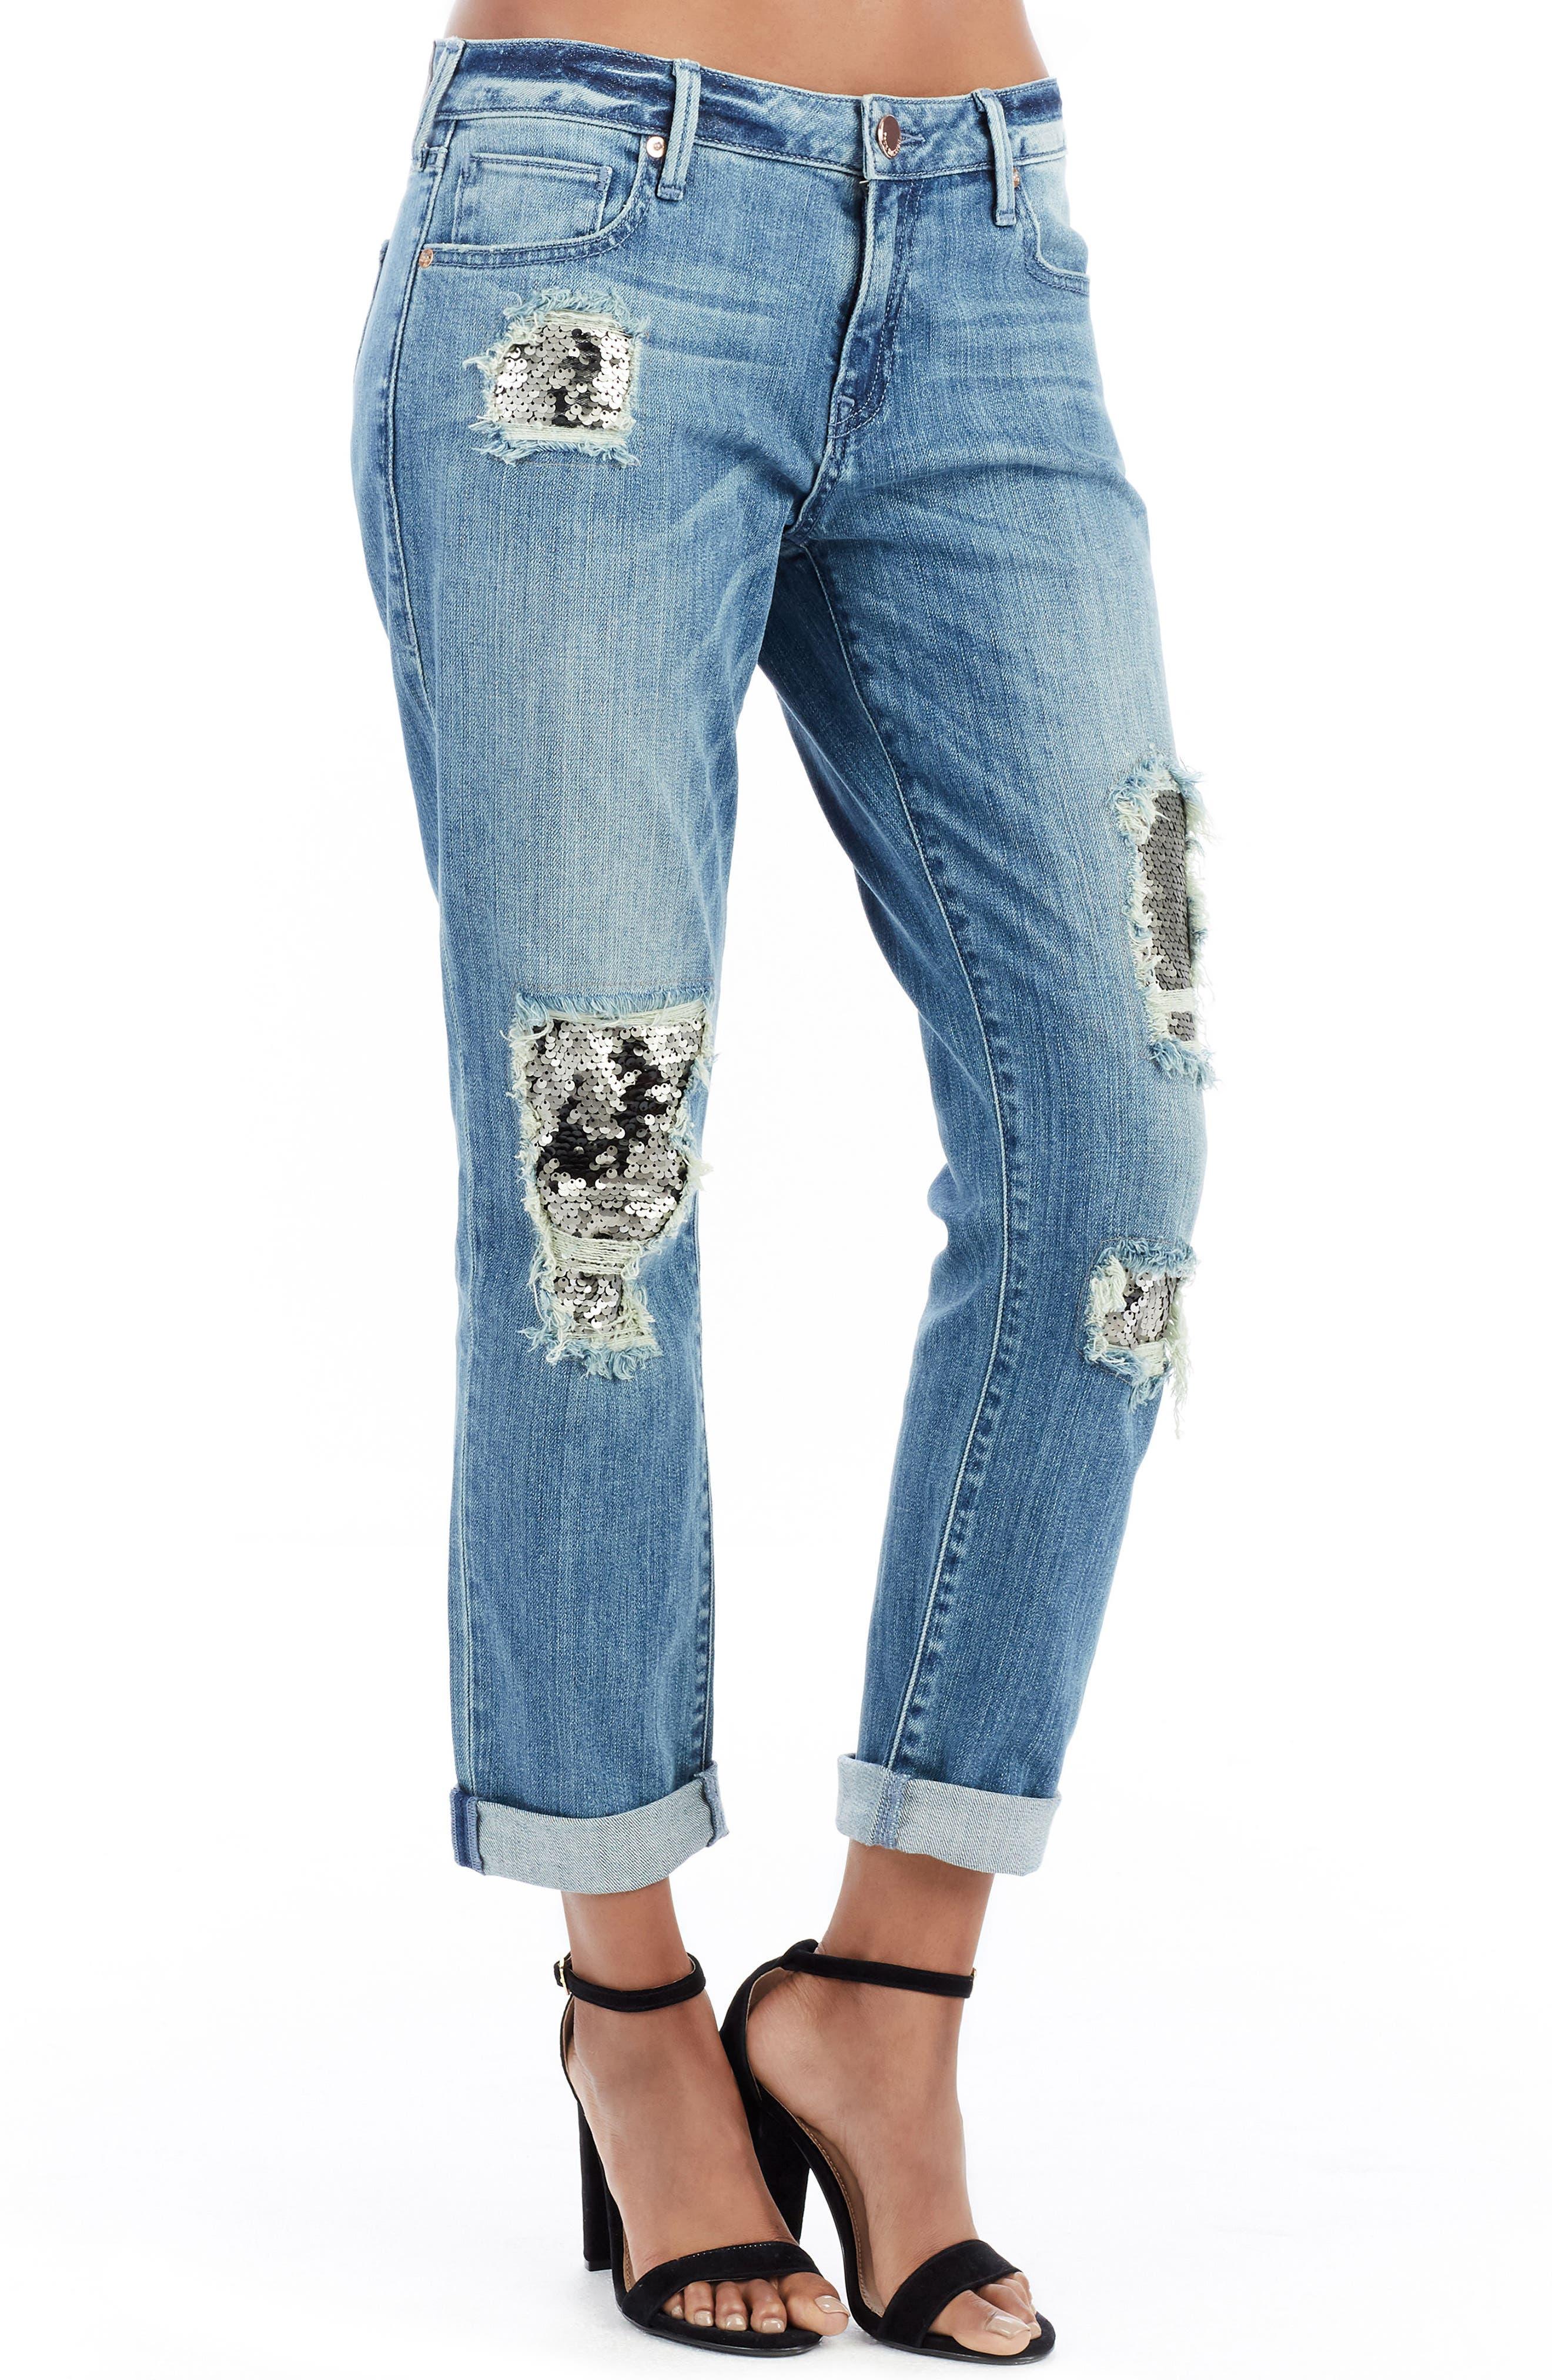 True Religion Brand Jeans Cameron Slim Boyfriend Jeans (Dark Rebel Status)